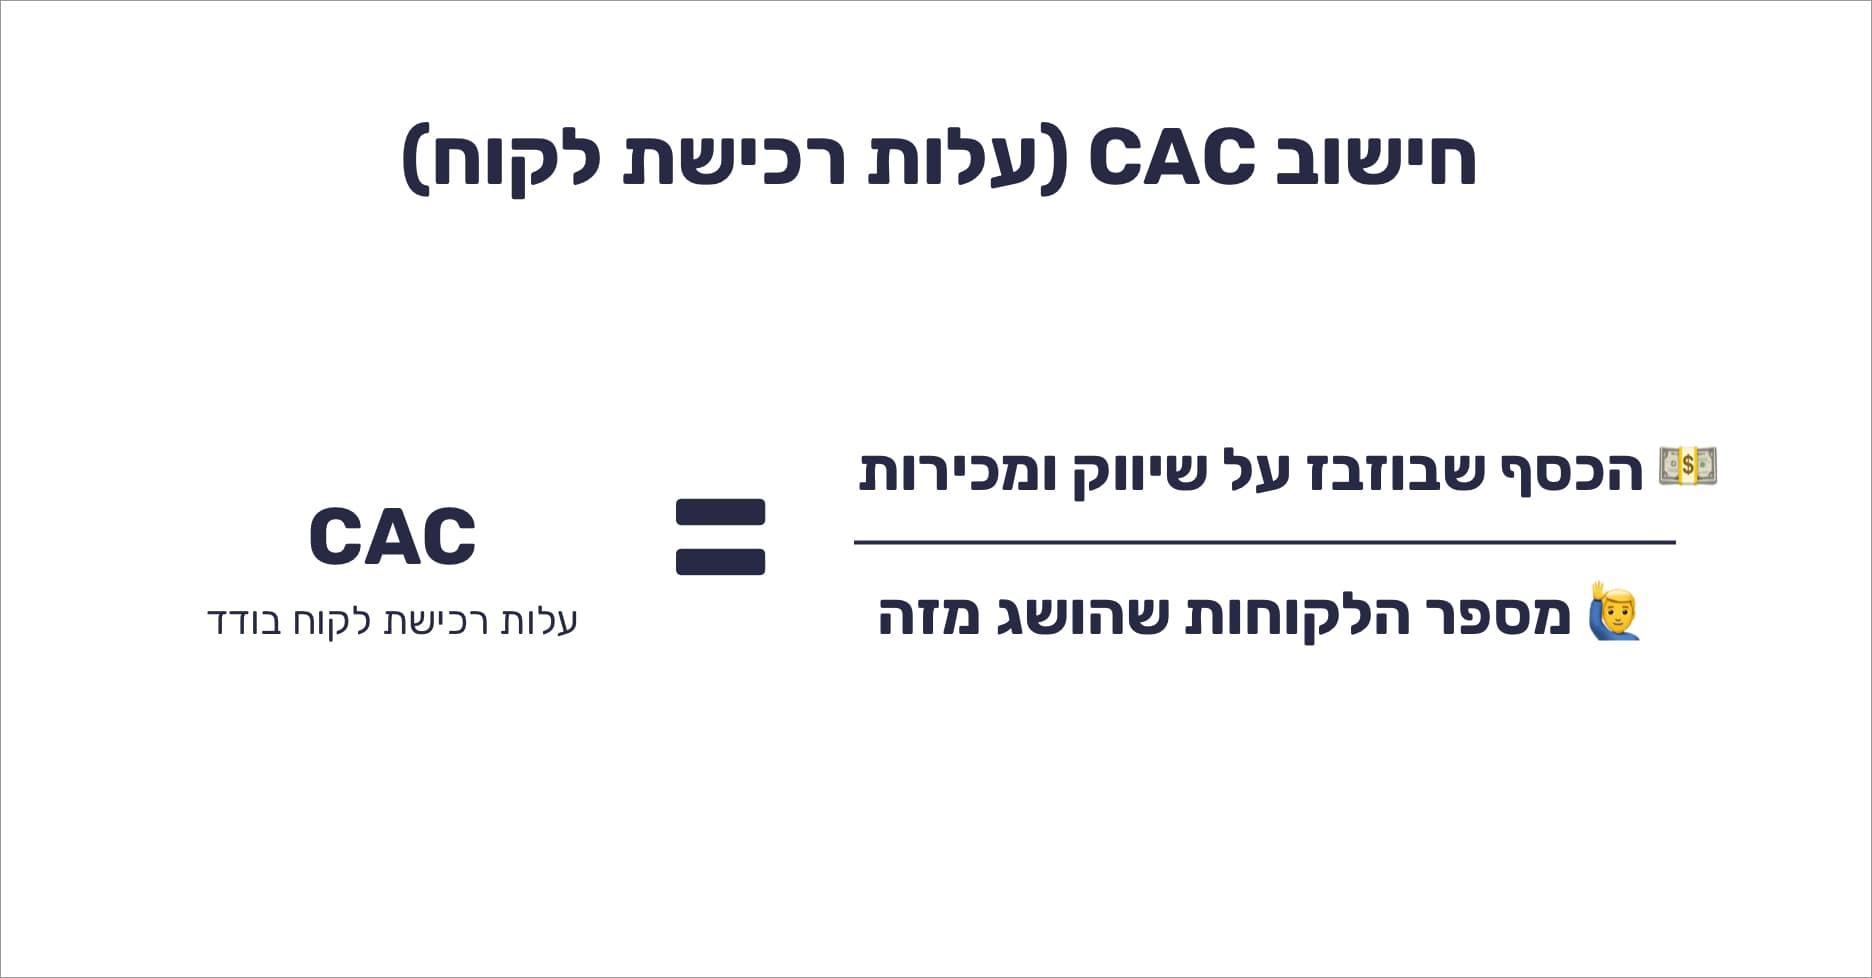 מה זה CAC (Customer Acquisition Cost)